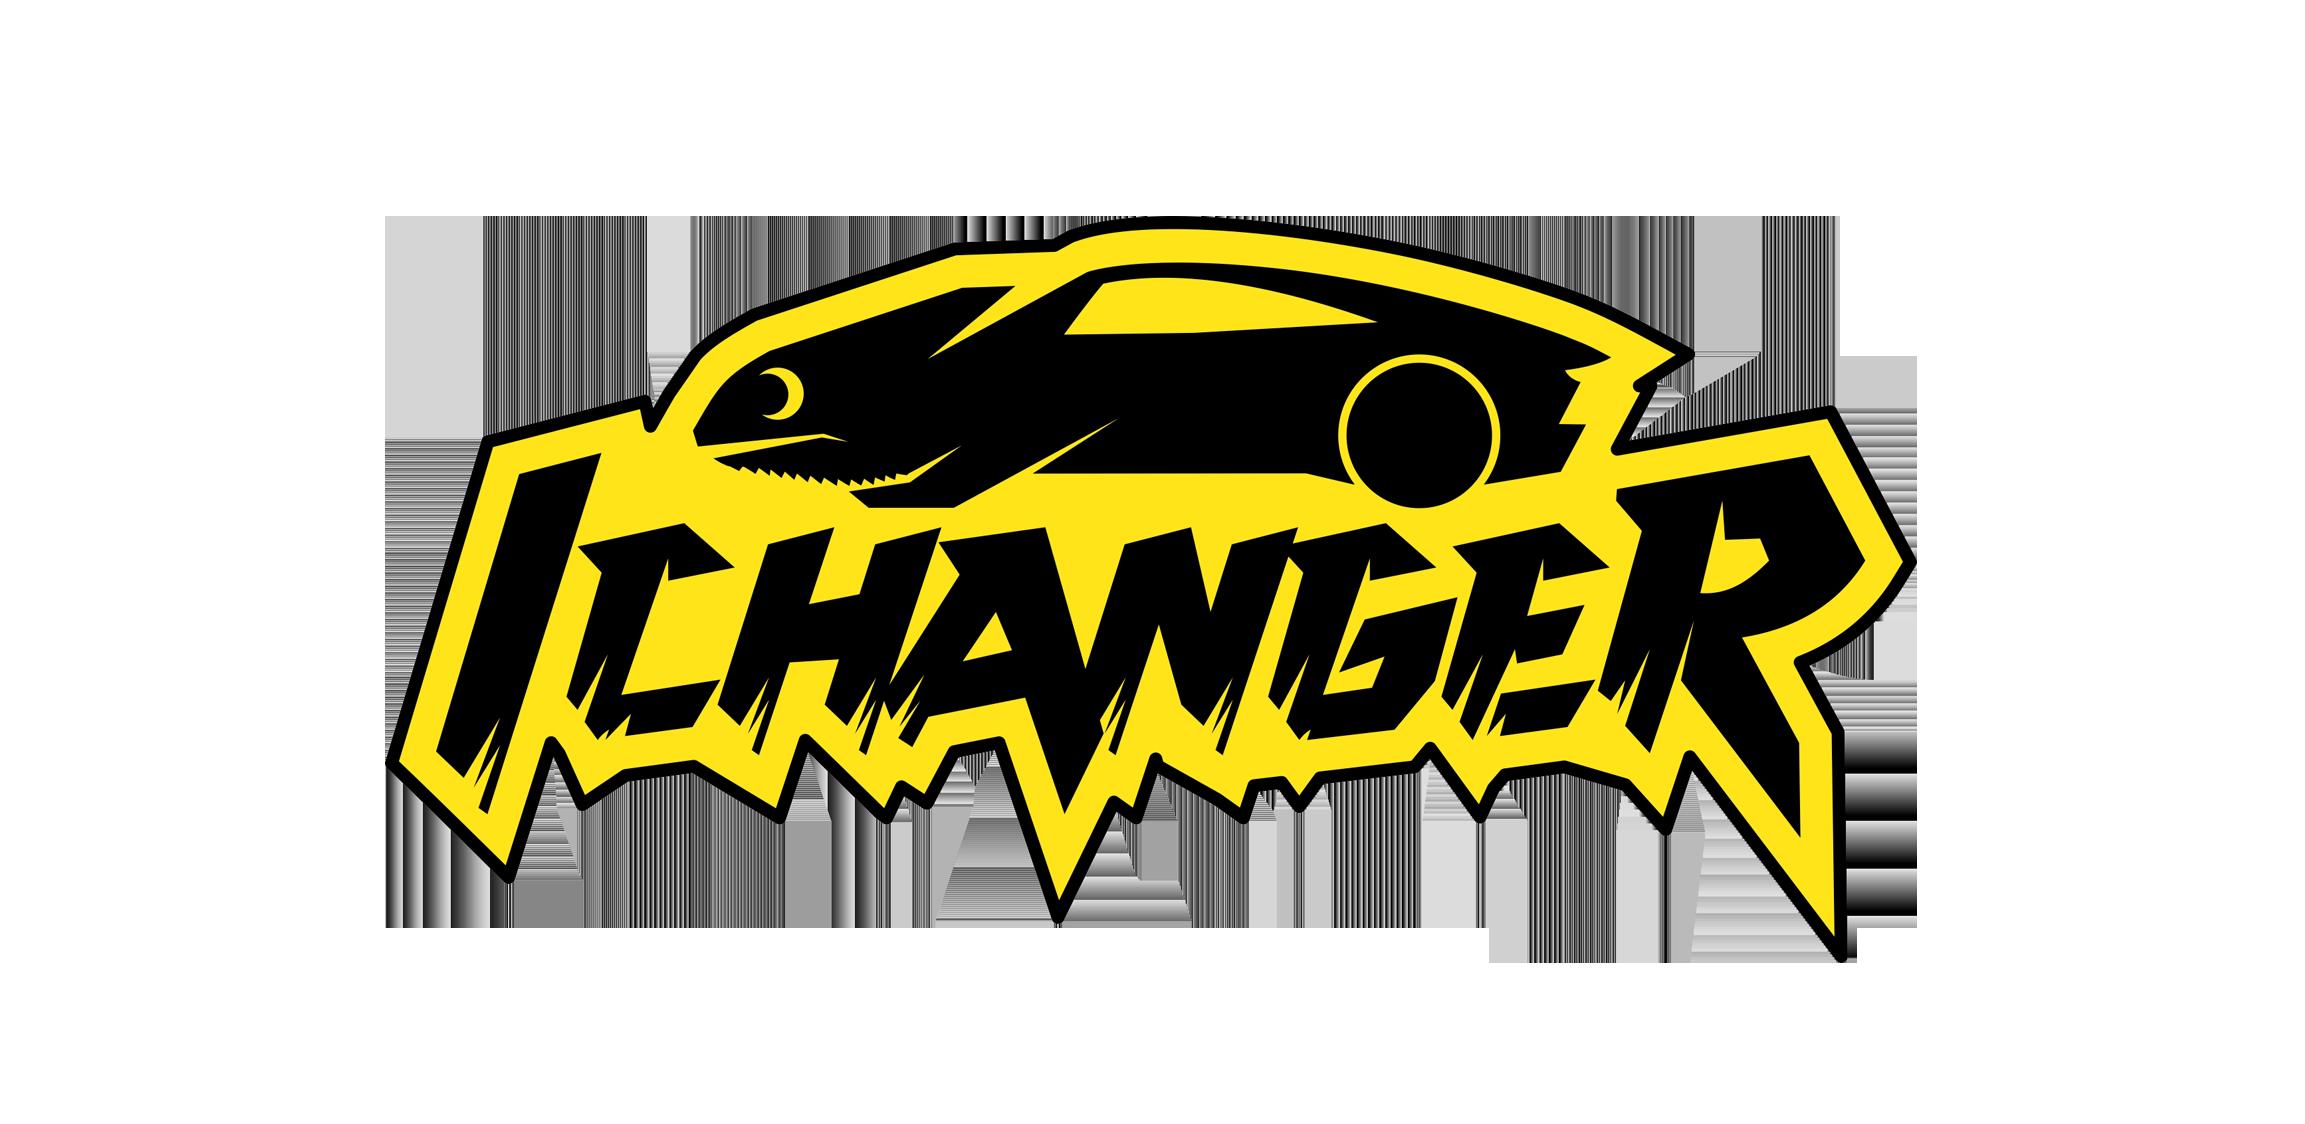 Ichanger ▼ Car Vinyl Wrap Film Manufacture and Supplier